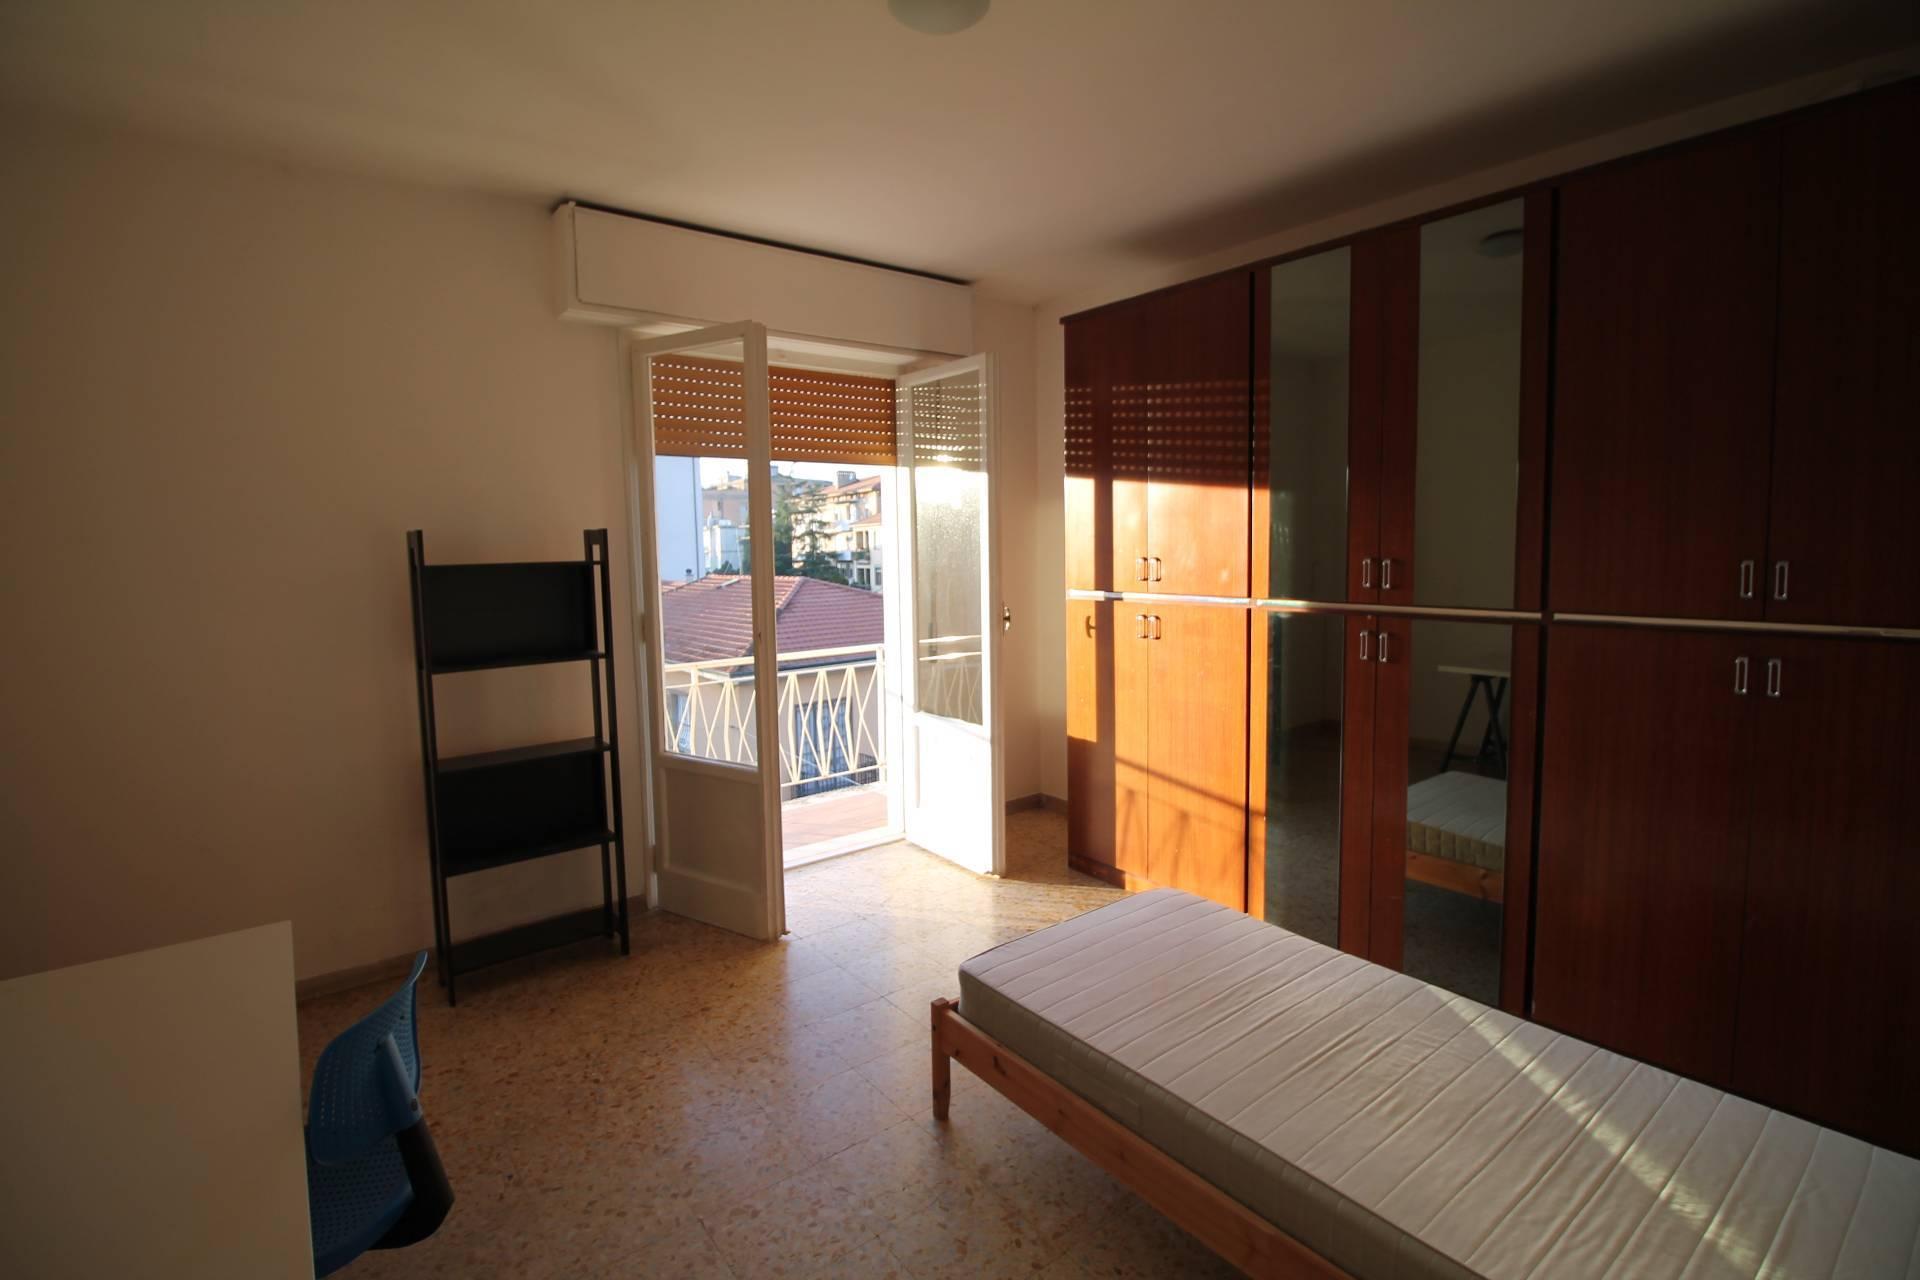 Appartamento in vendita, rif. V2841B